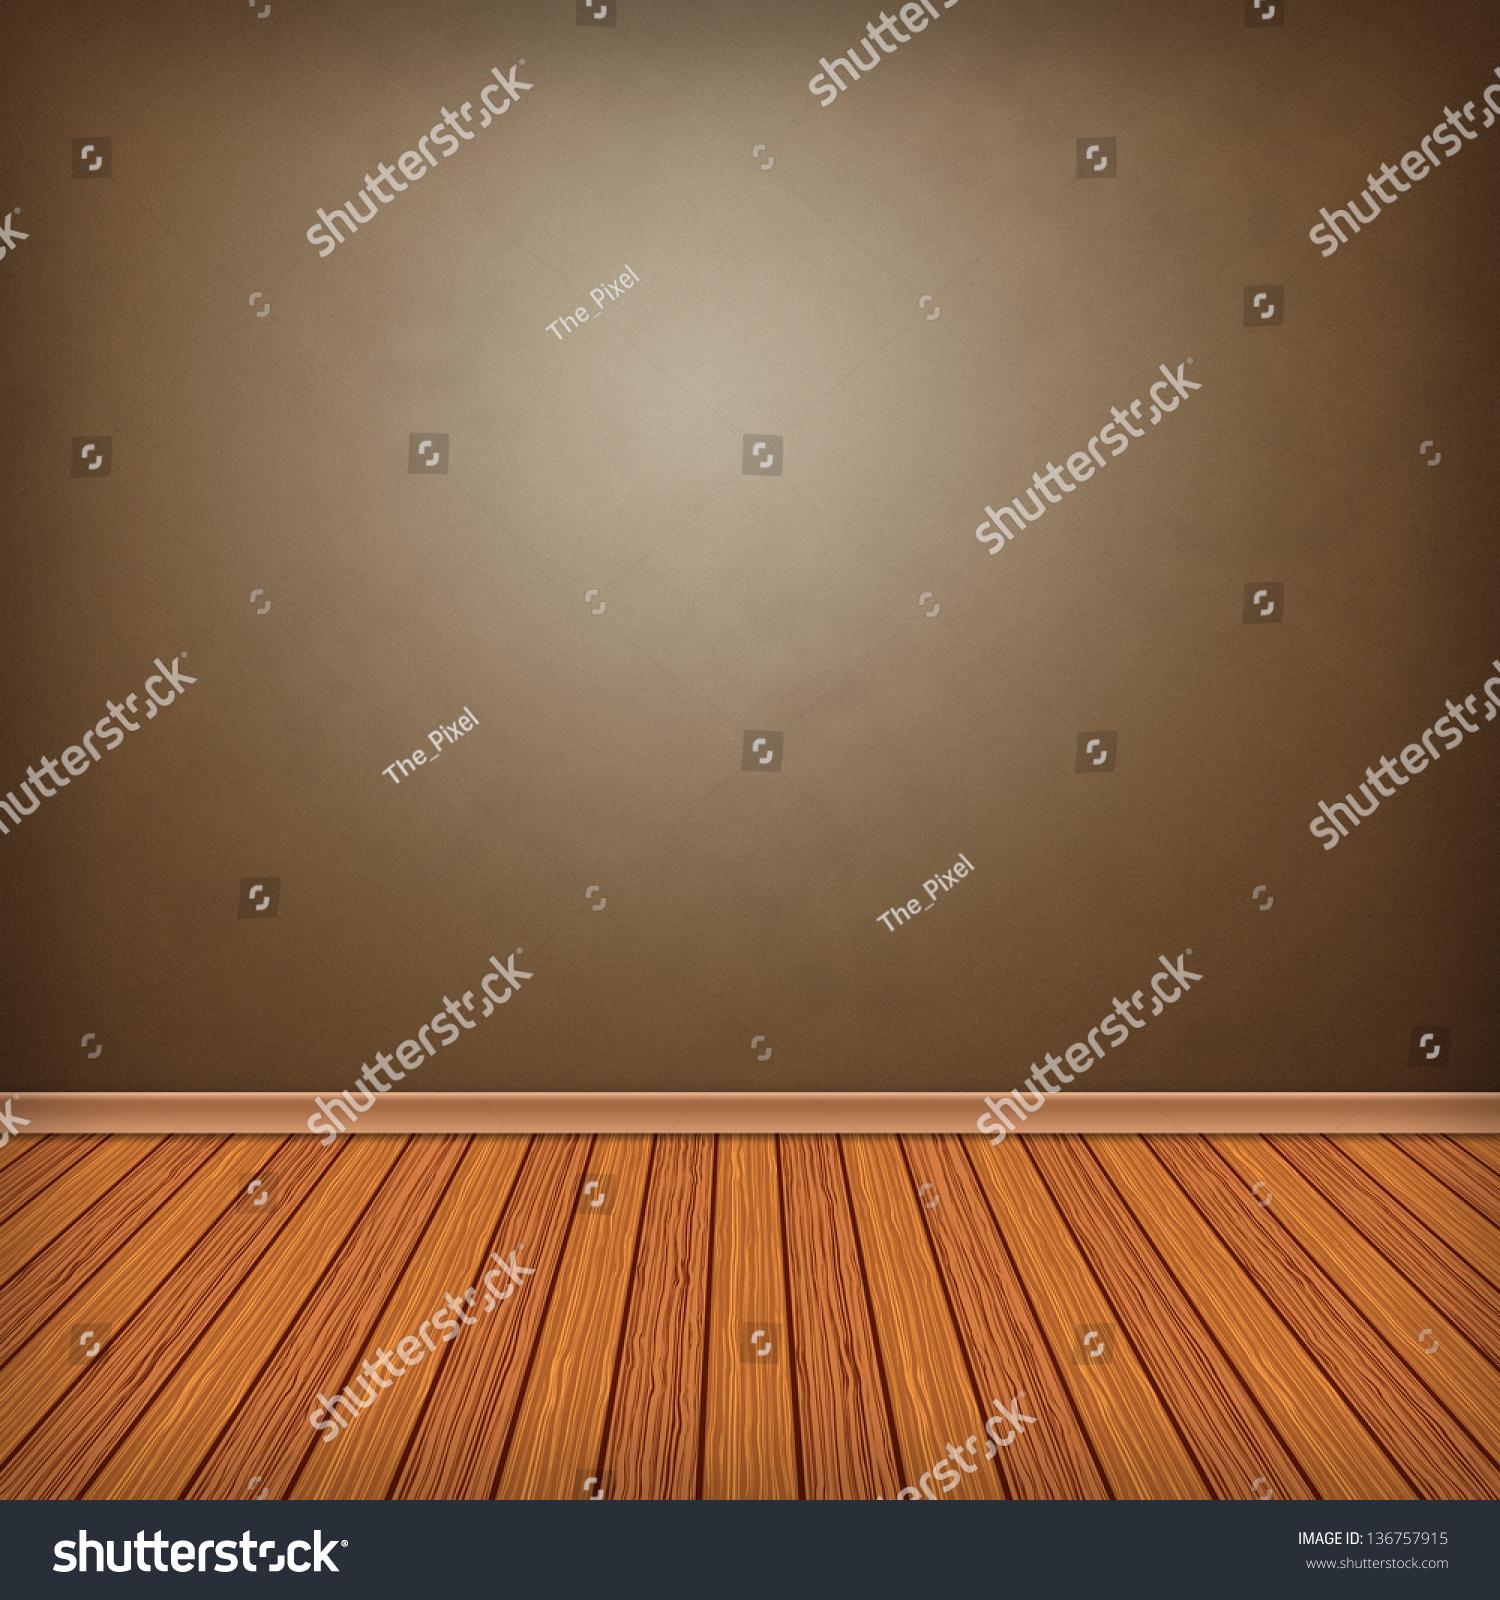 Best Wallpaper High Resolution Wood - stock-photo-empty-room-interior-with-wallpaper-high-resolution-texture-background-136757915  2018_614550.jpg